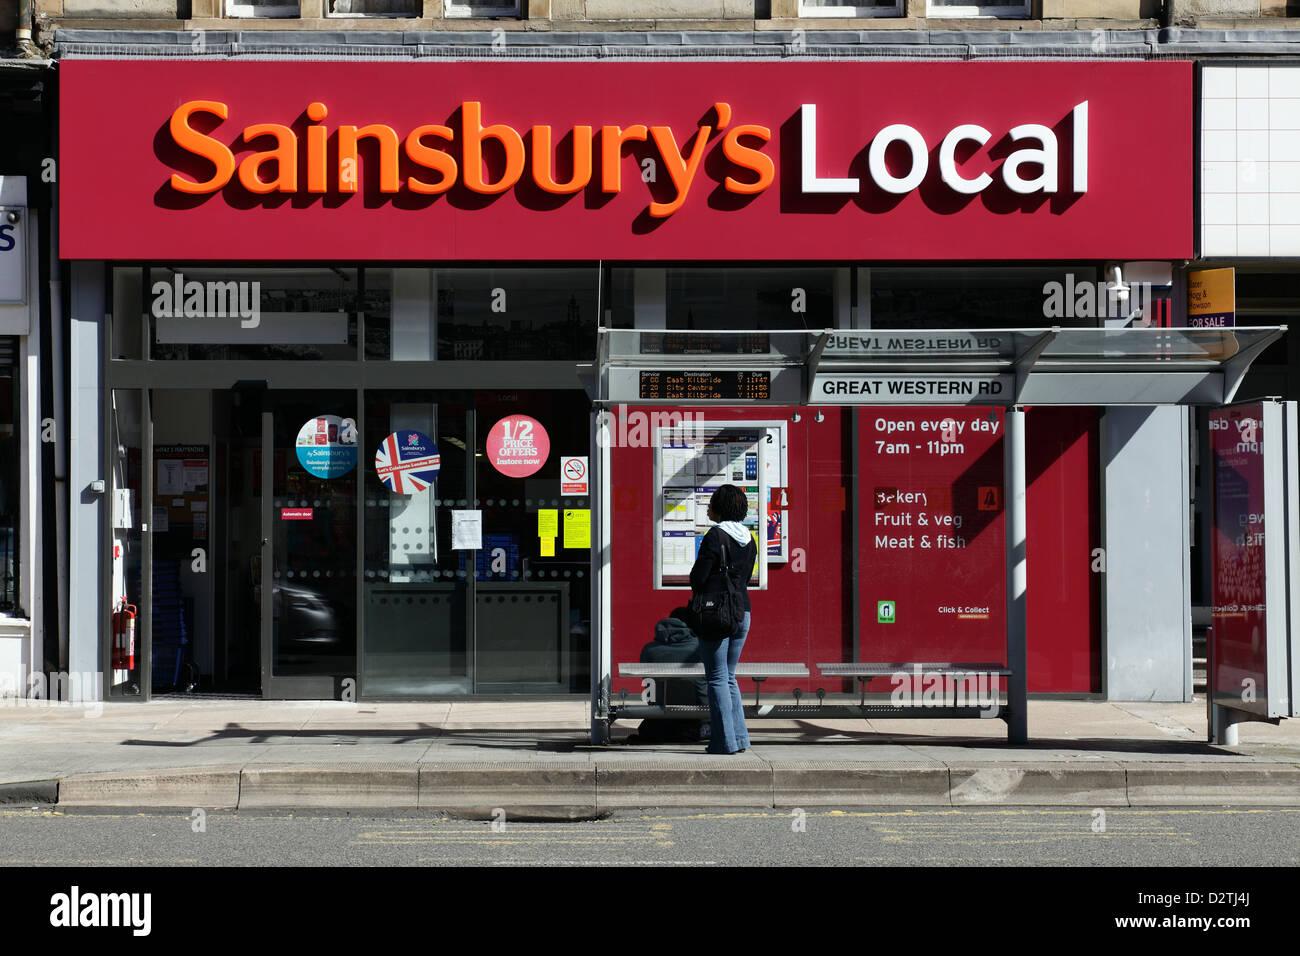 A Sainsbury's Local store, UK - Stock Image